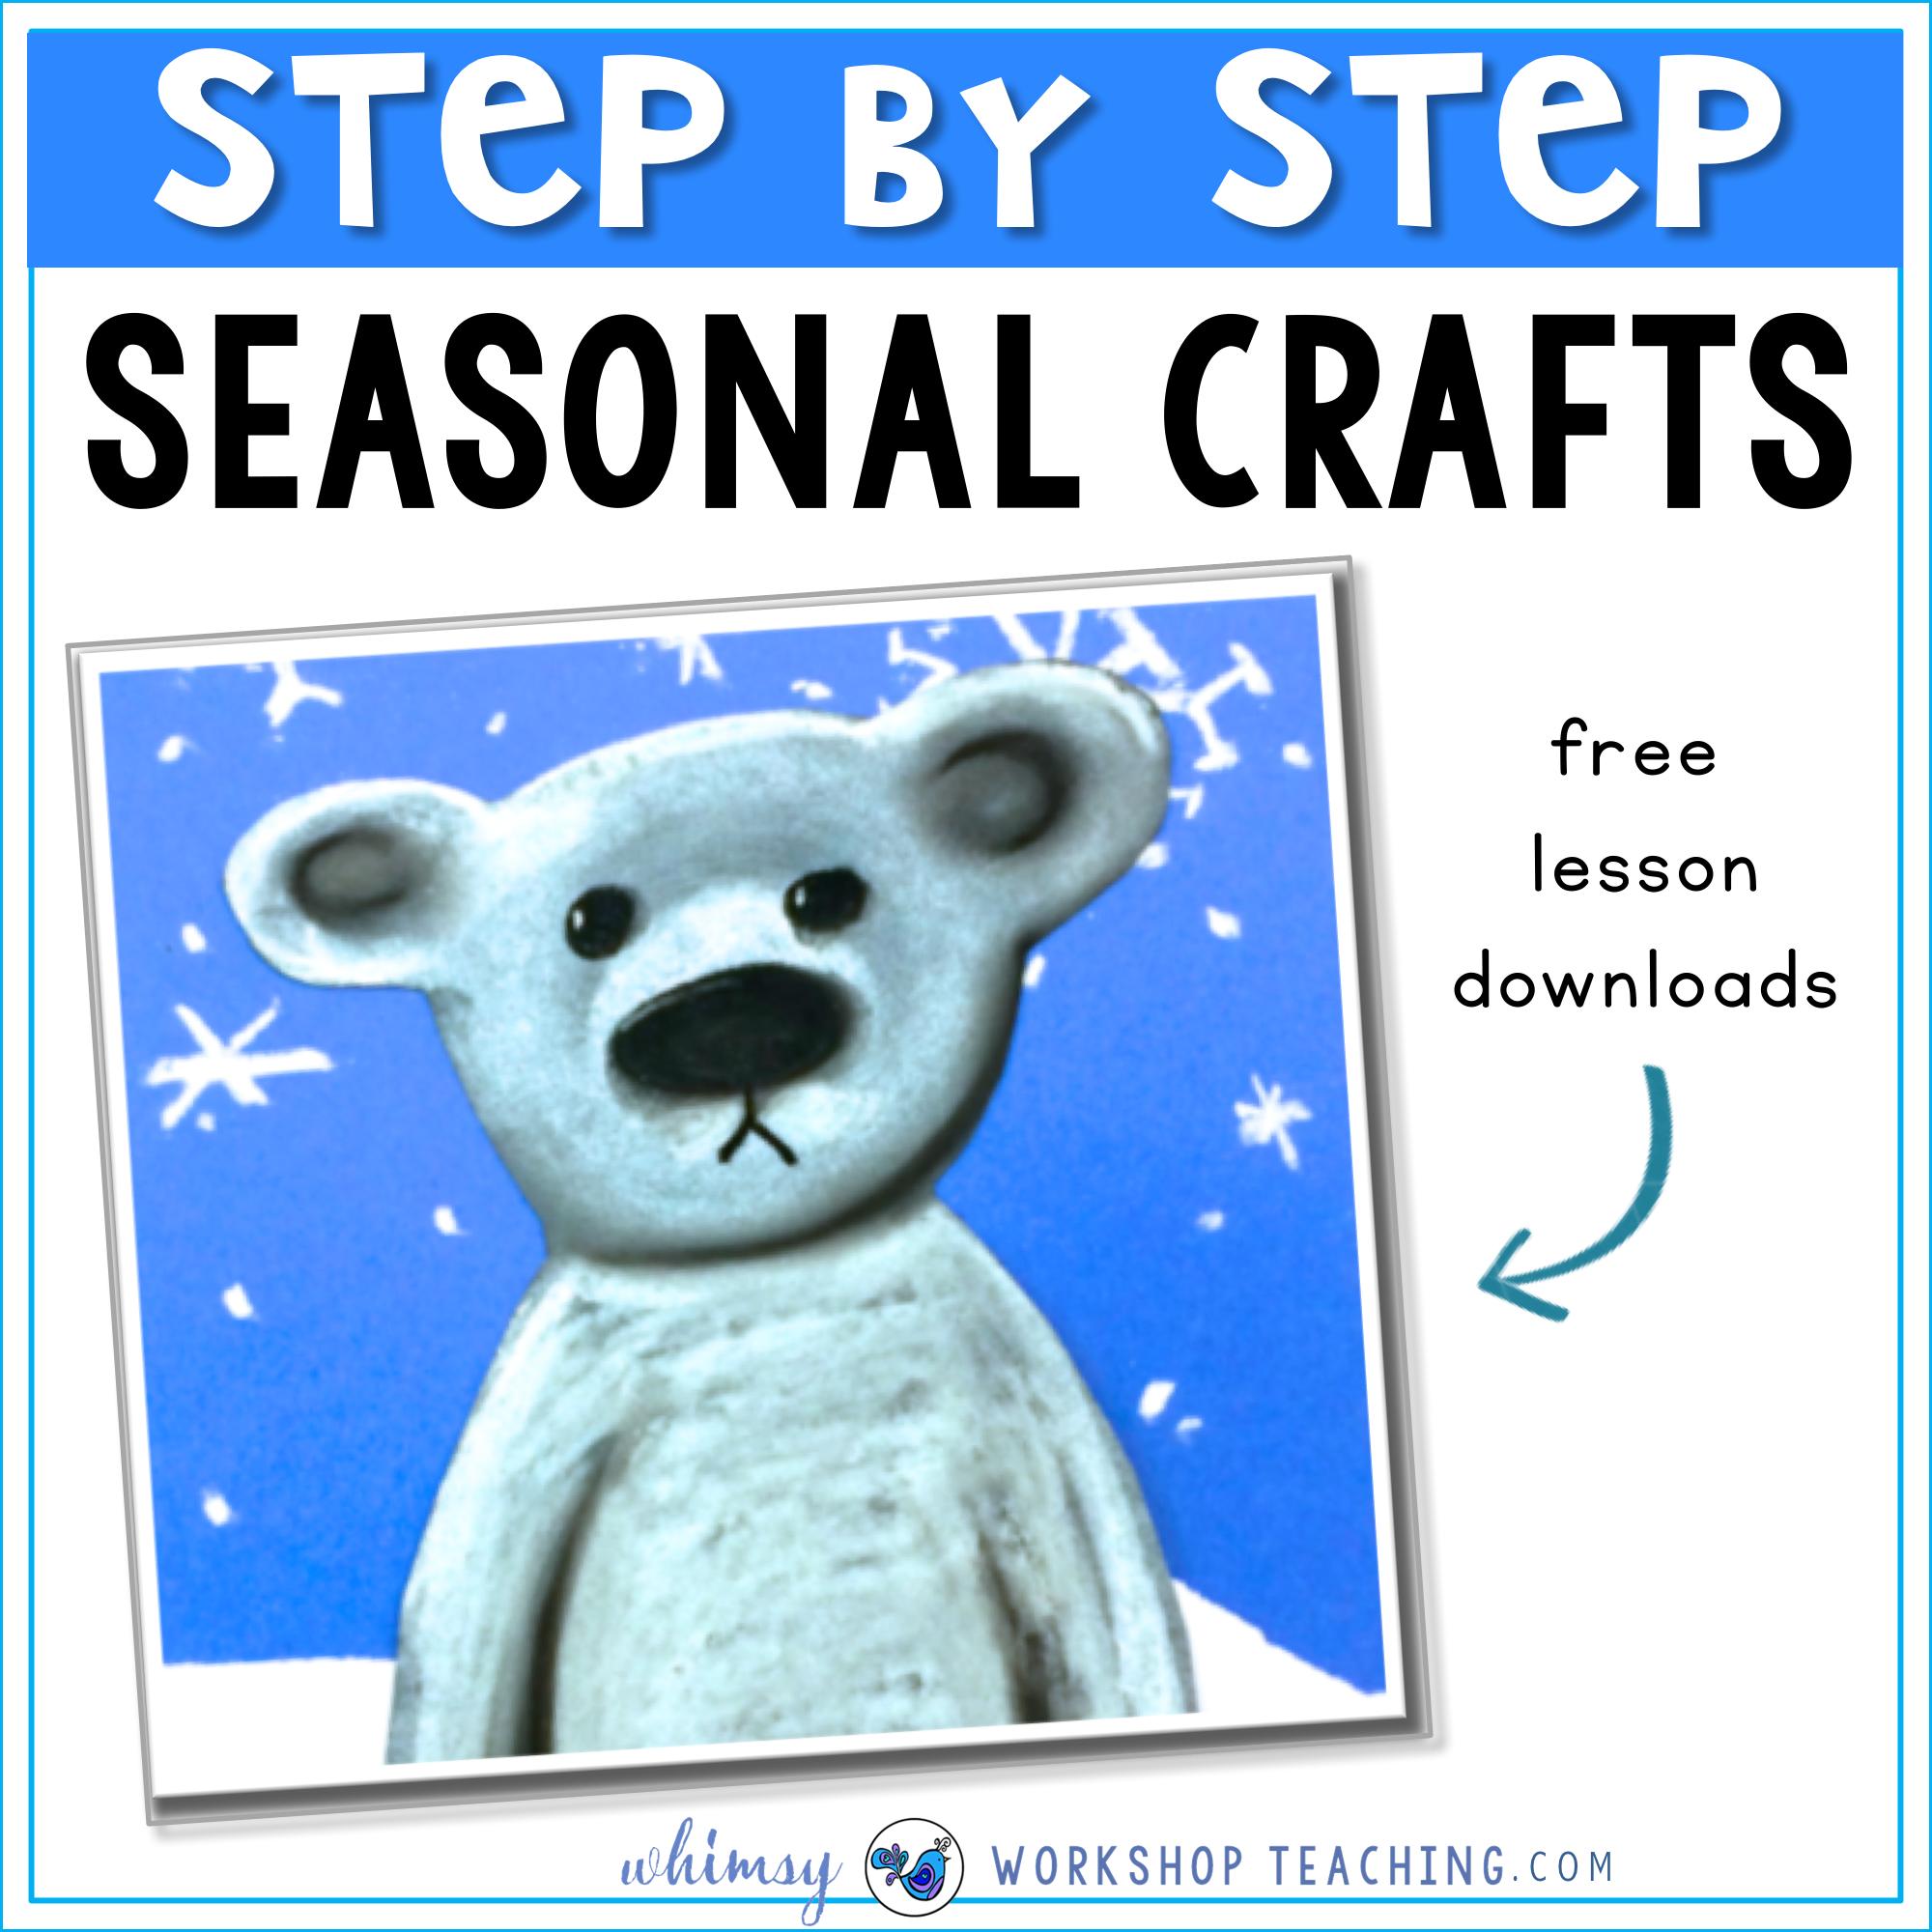 Step by step seasonal craft ideas through the whole year